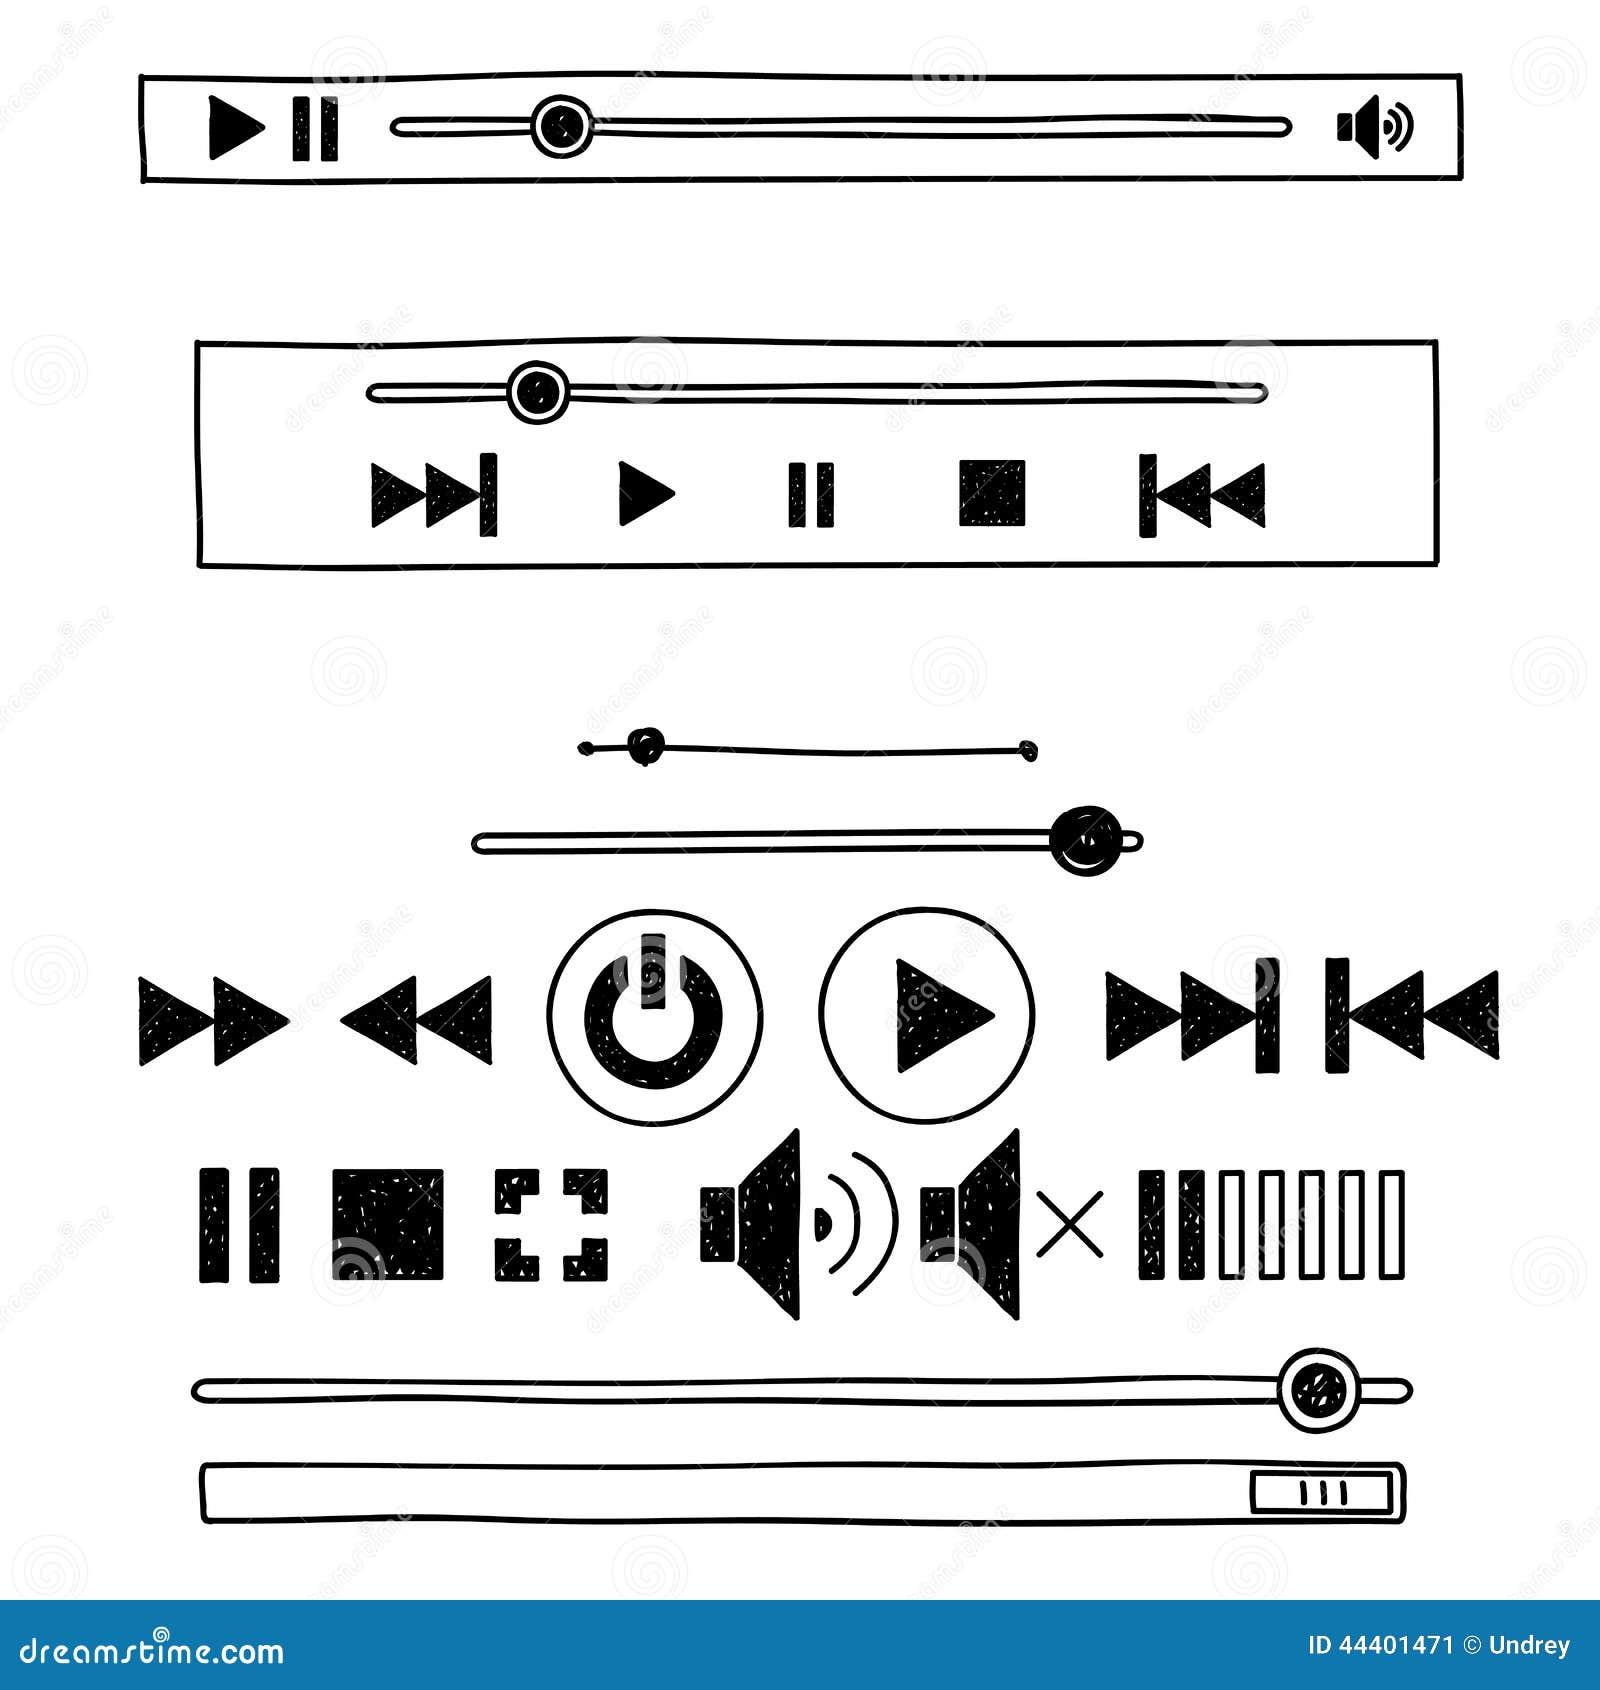 Skizzen-Gekritzel-Audiospieler des Handabgehobenen betrages für Netz